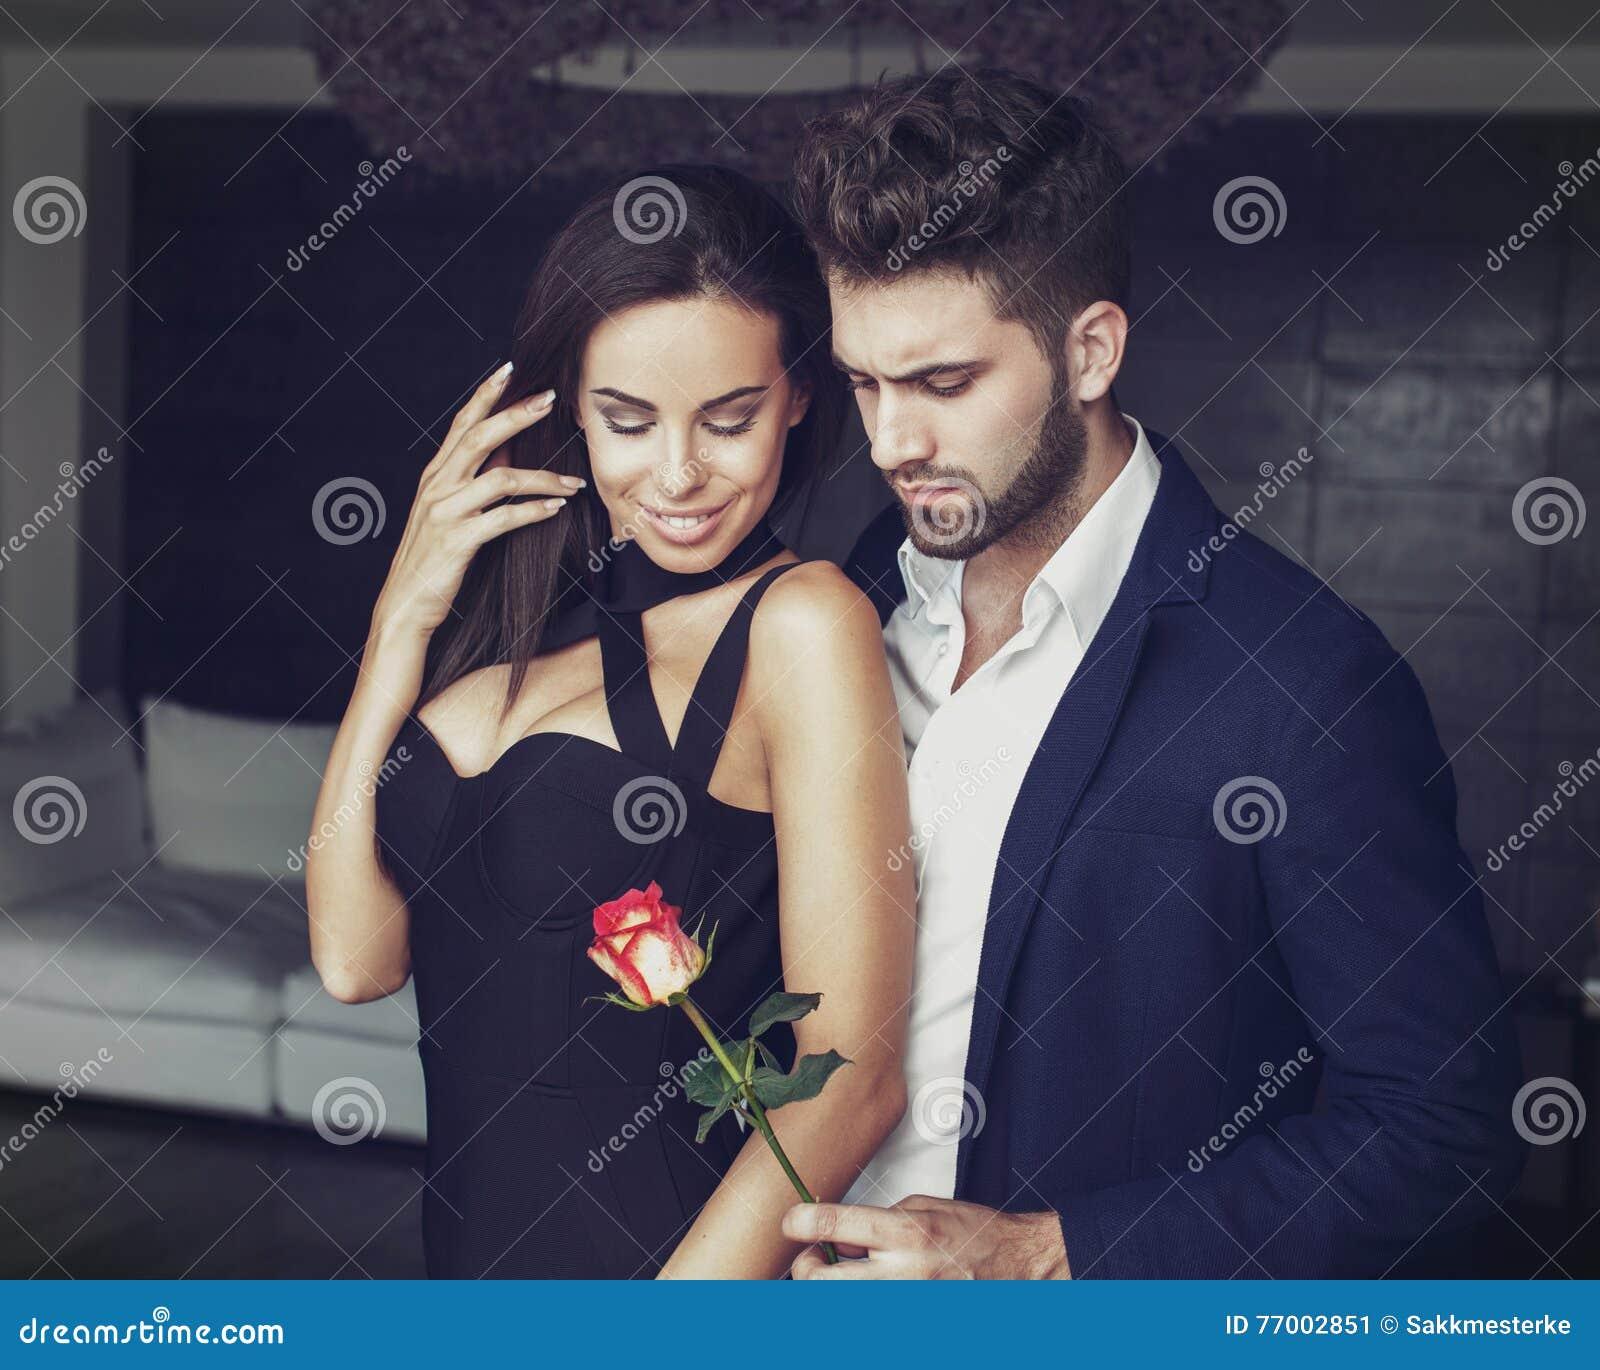 How to pleasure a womans clit